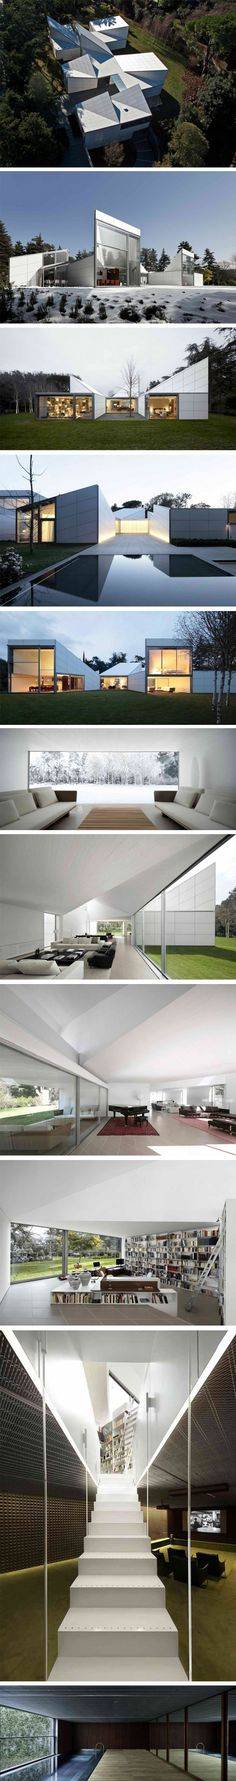 AA House by OAB, Barcelona, Spain